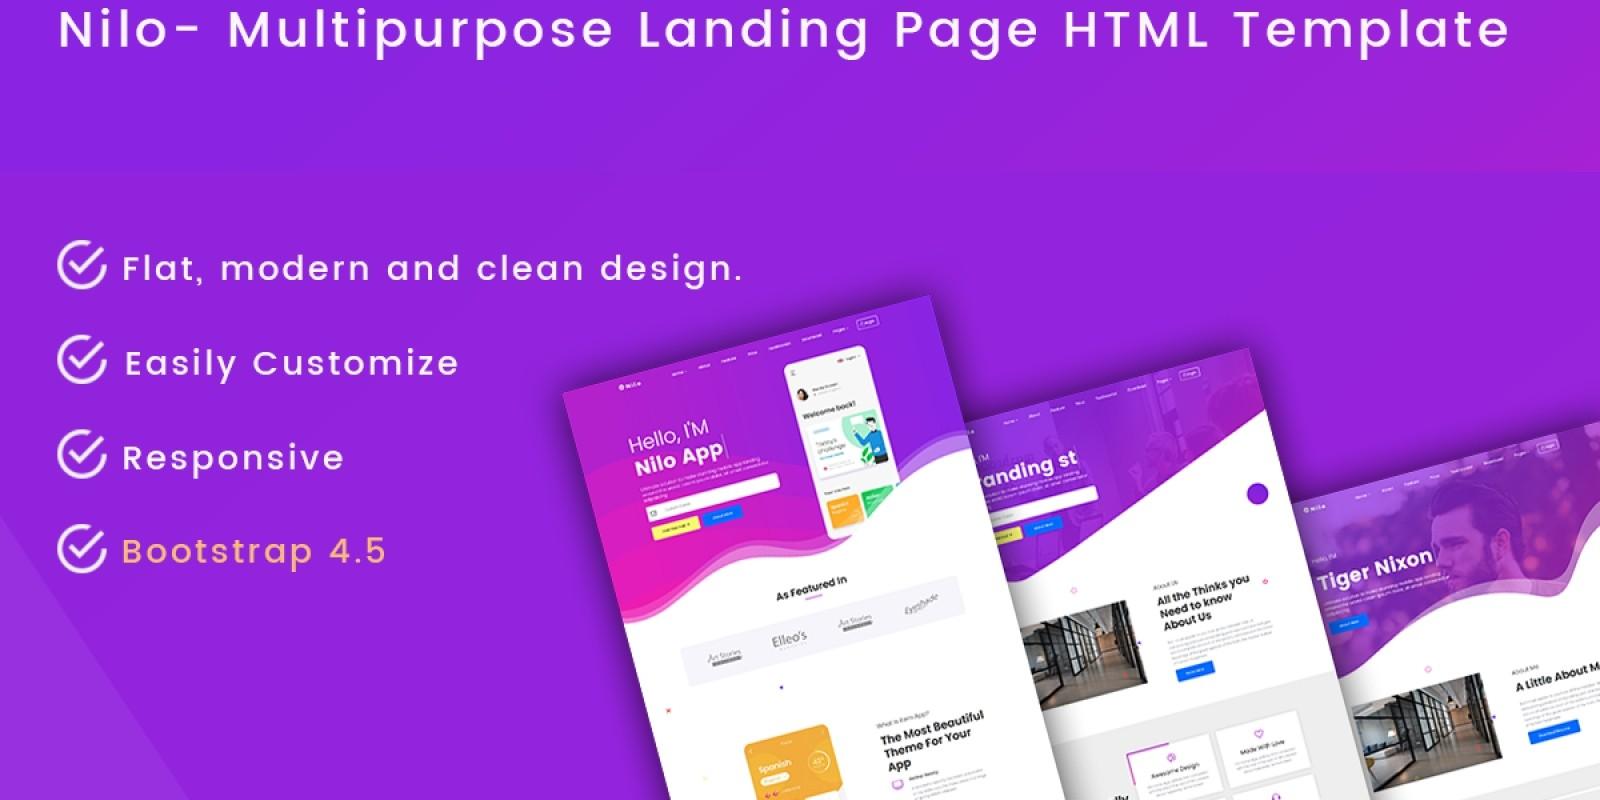 Nilo - Multipurpose Landing Page HTML Template